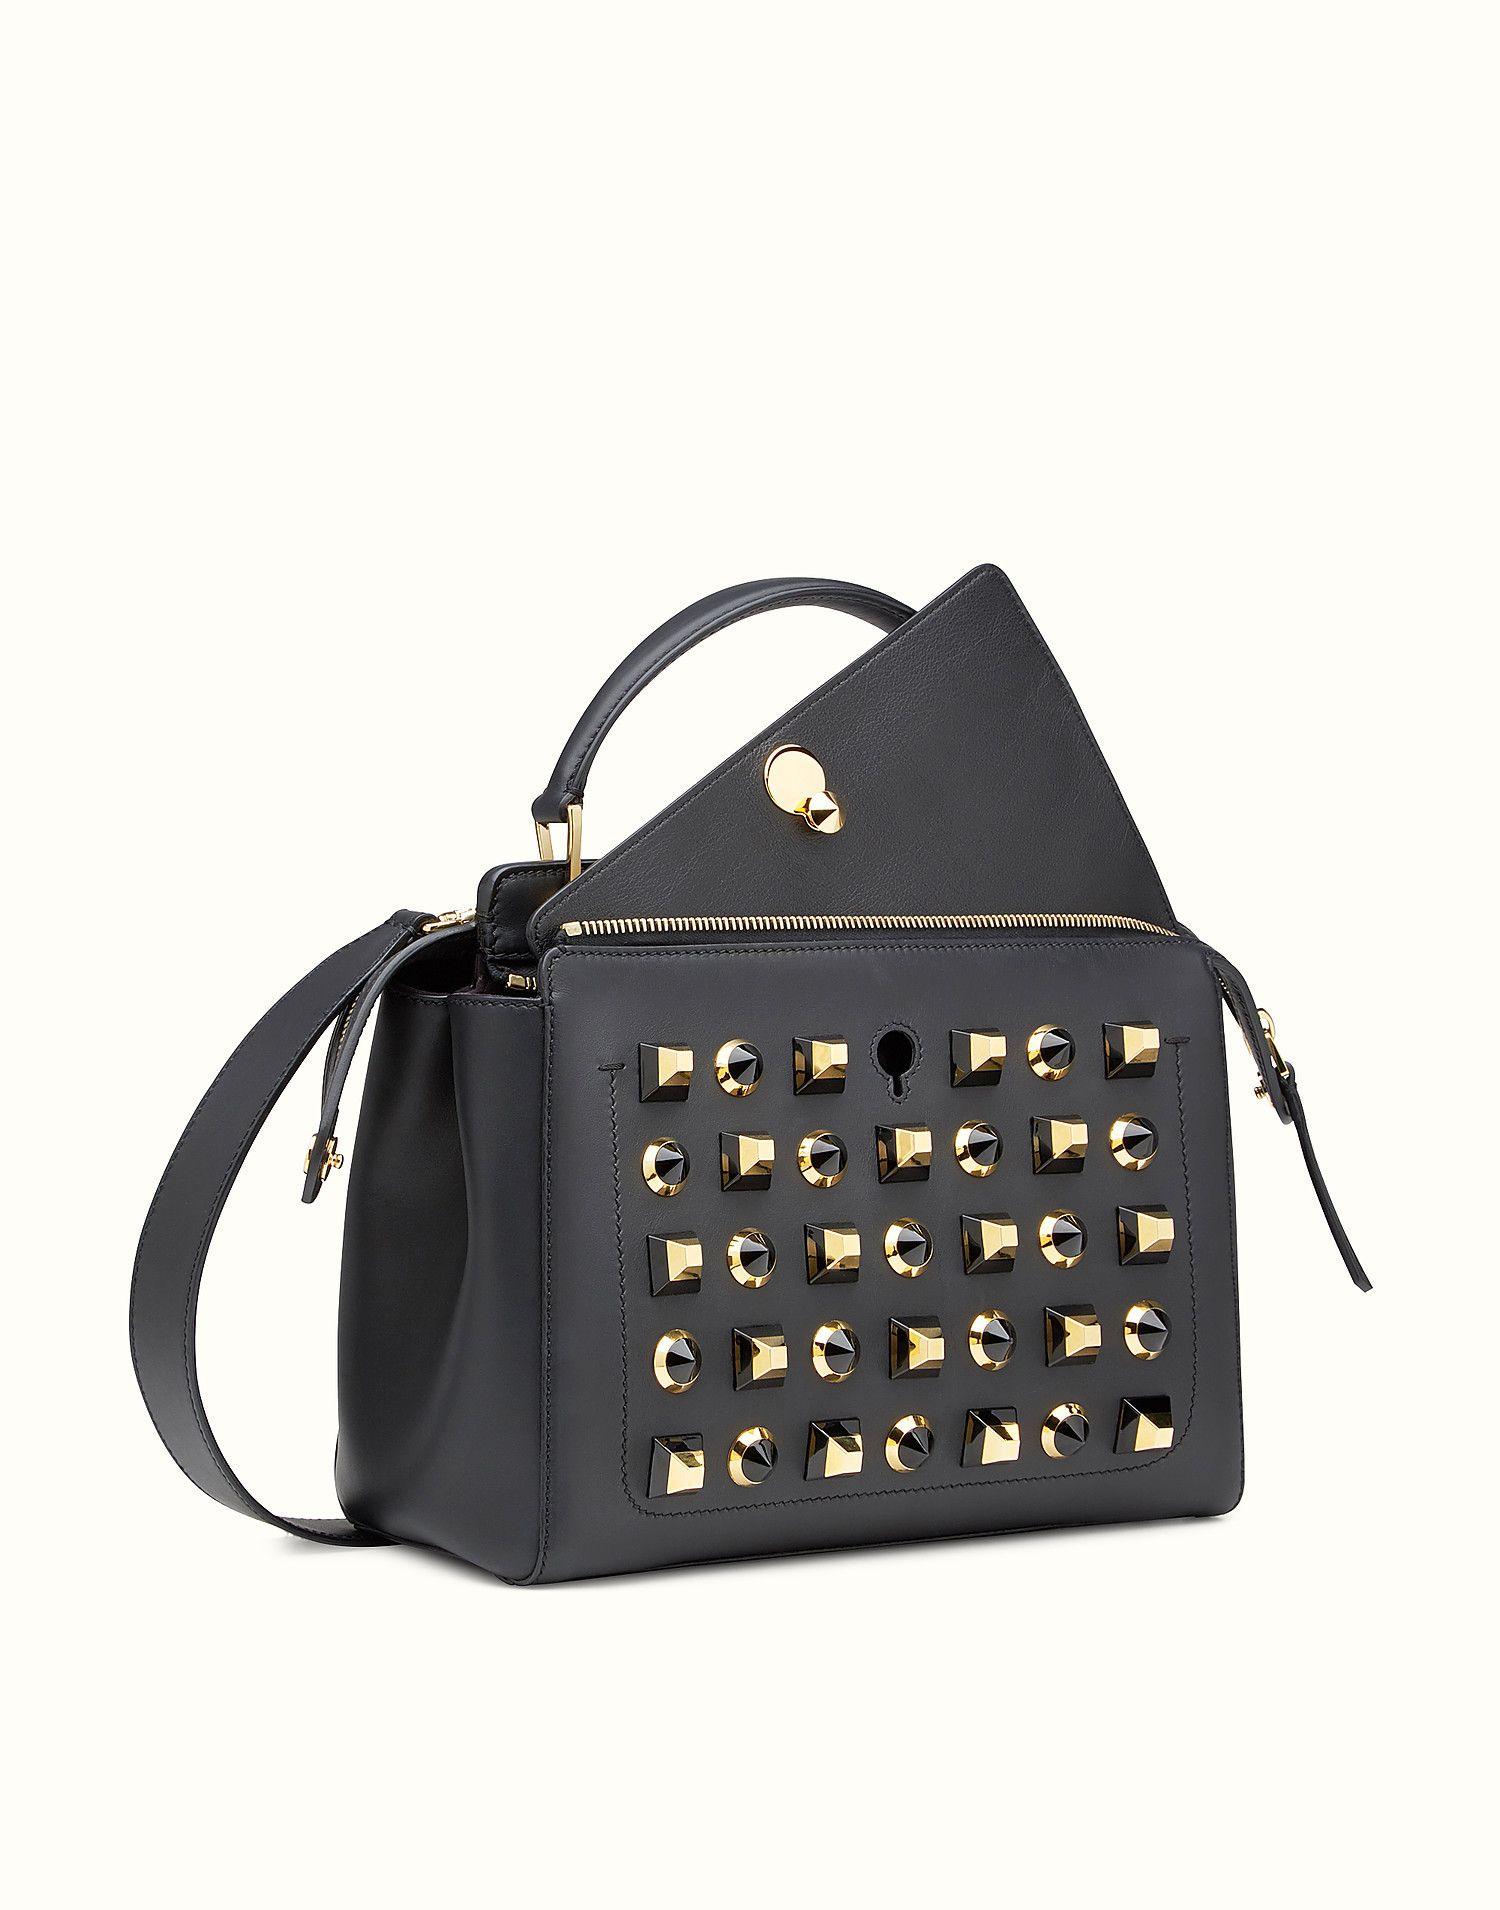 FENDI DOTCOM GOLD EDITION - black leather handbag and clutch bag - view 2  zoom d9948d4b7f164